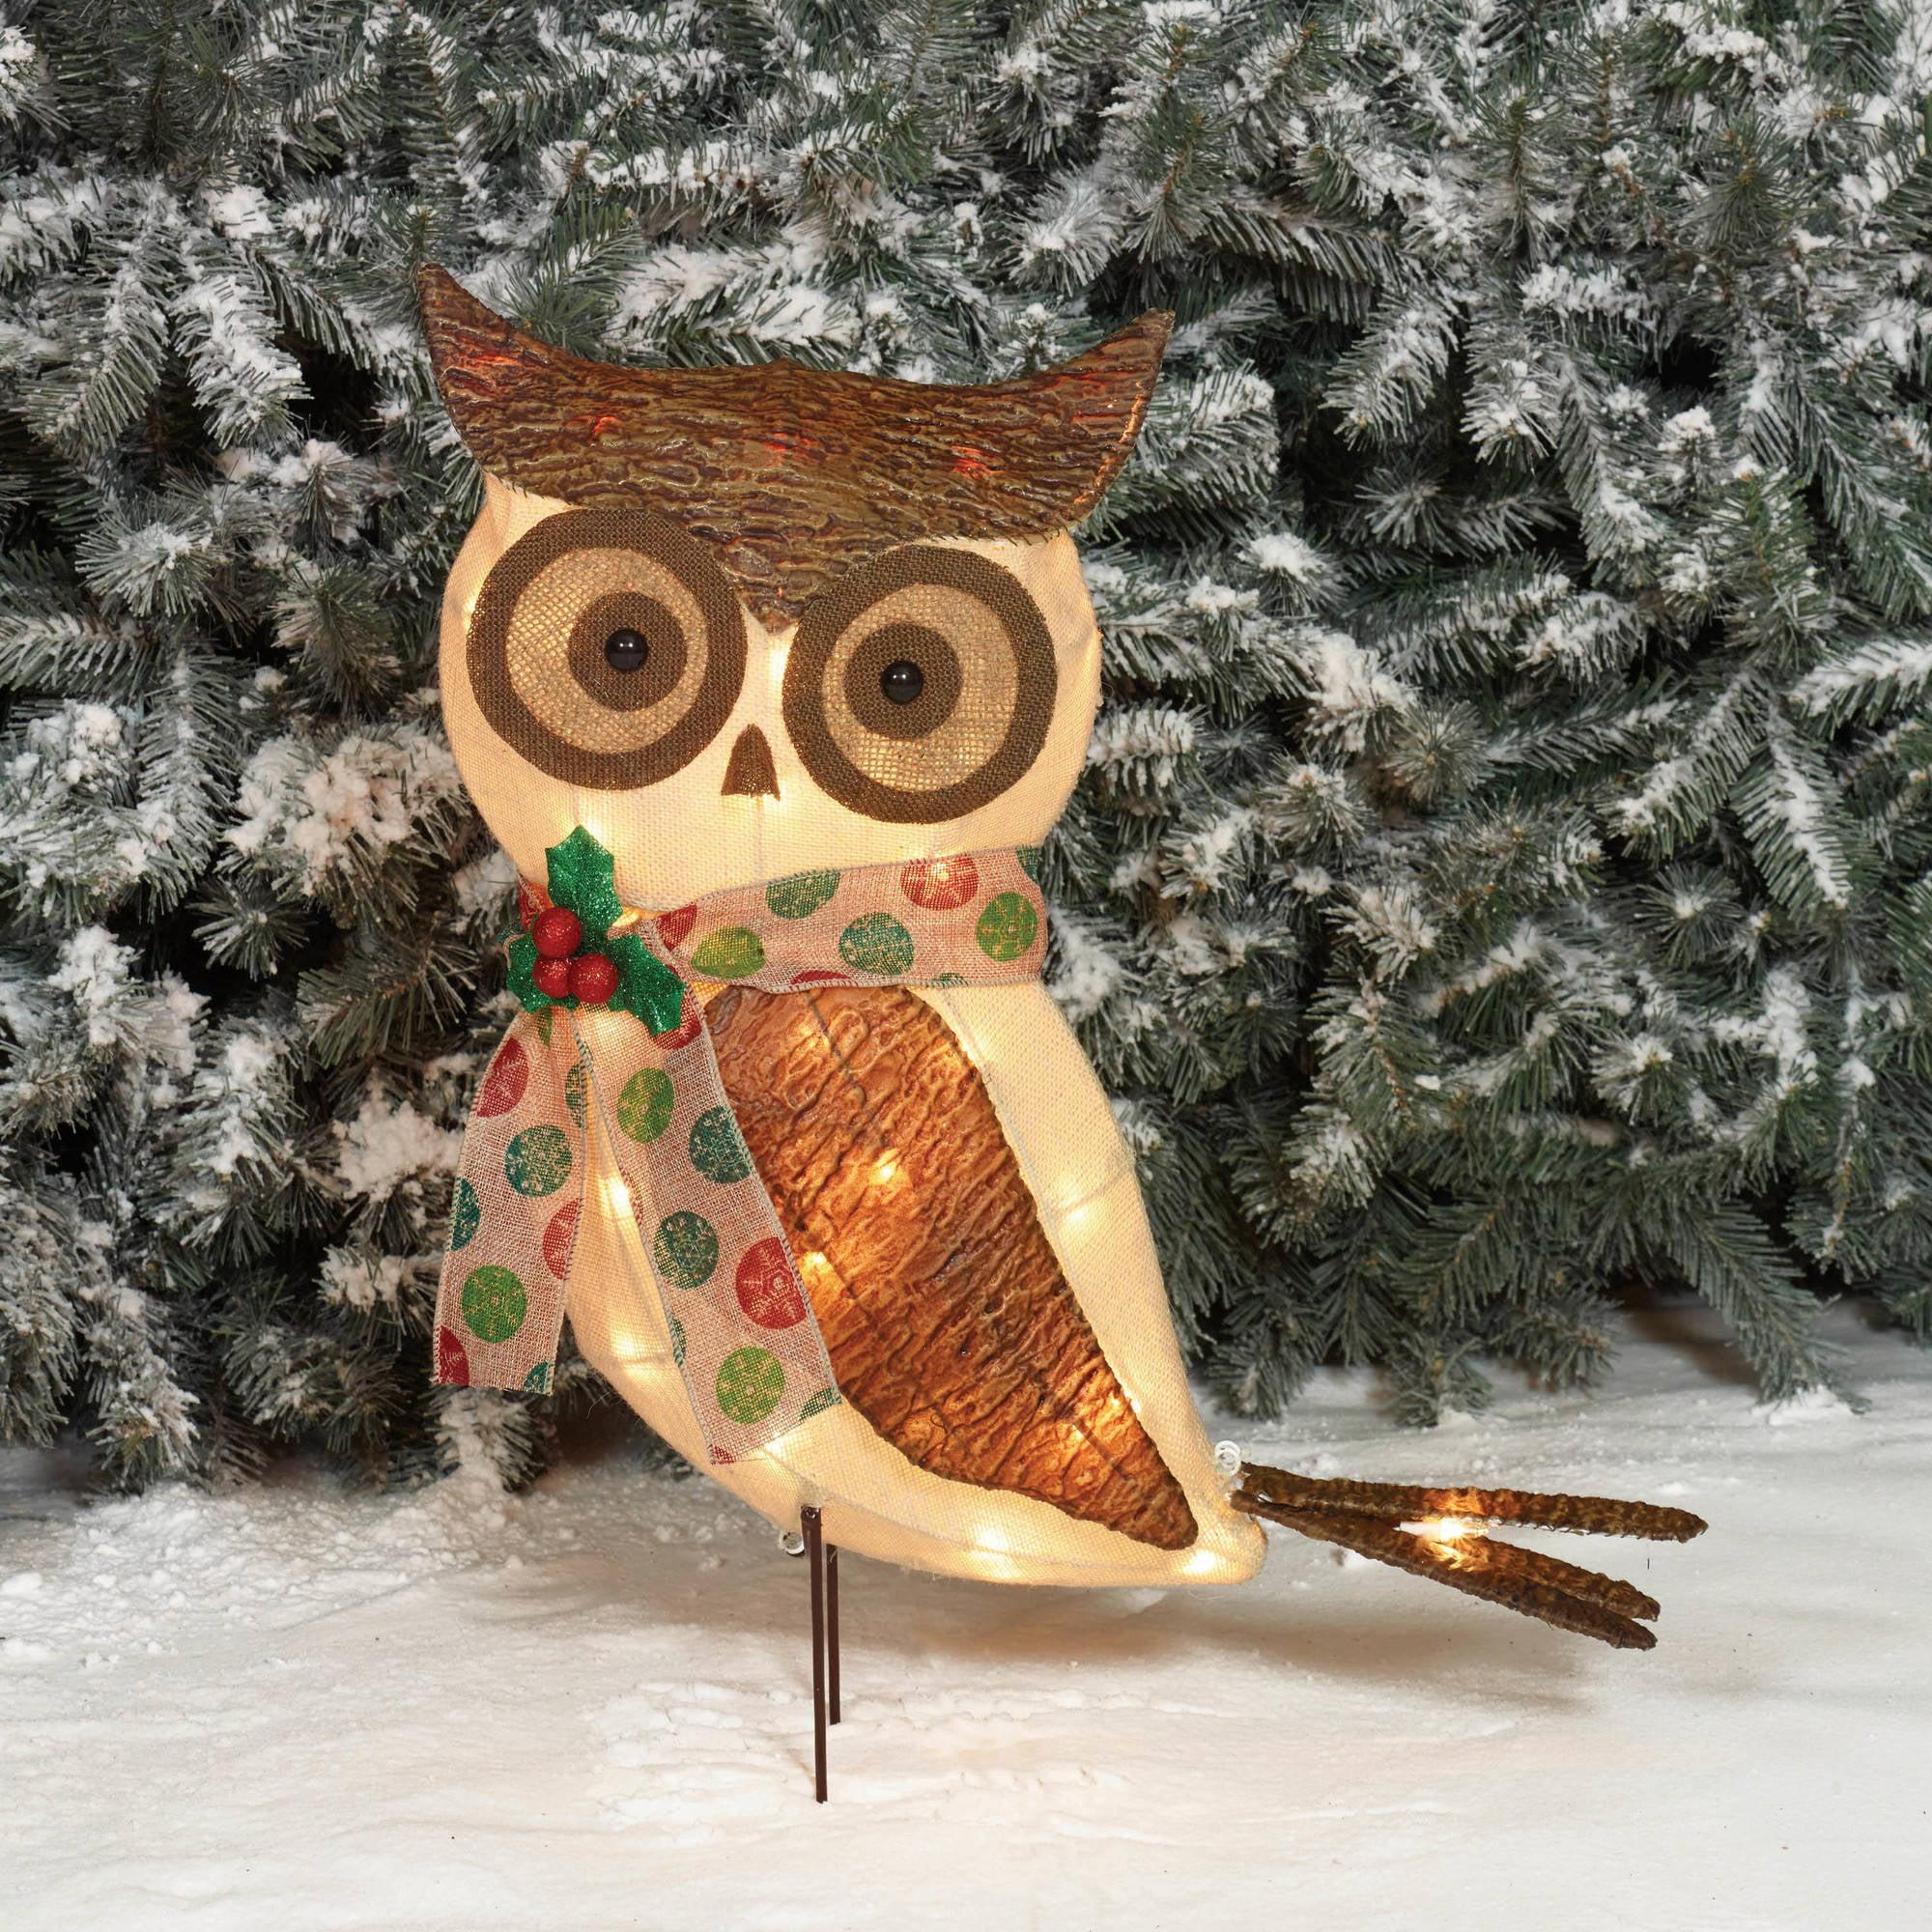 Christmas Owl.Holiday Time Christmas Decor 24 Sparkling Burlap With Bark Owl Sculpture